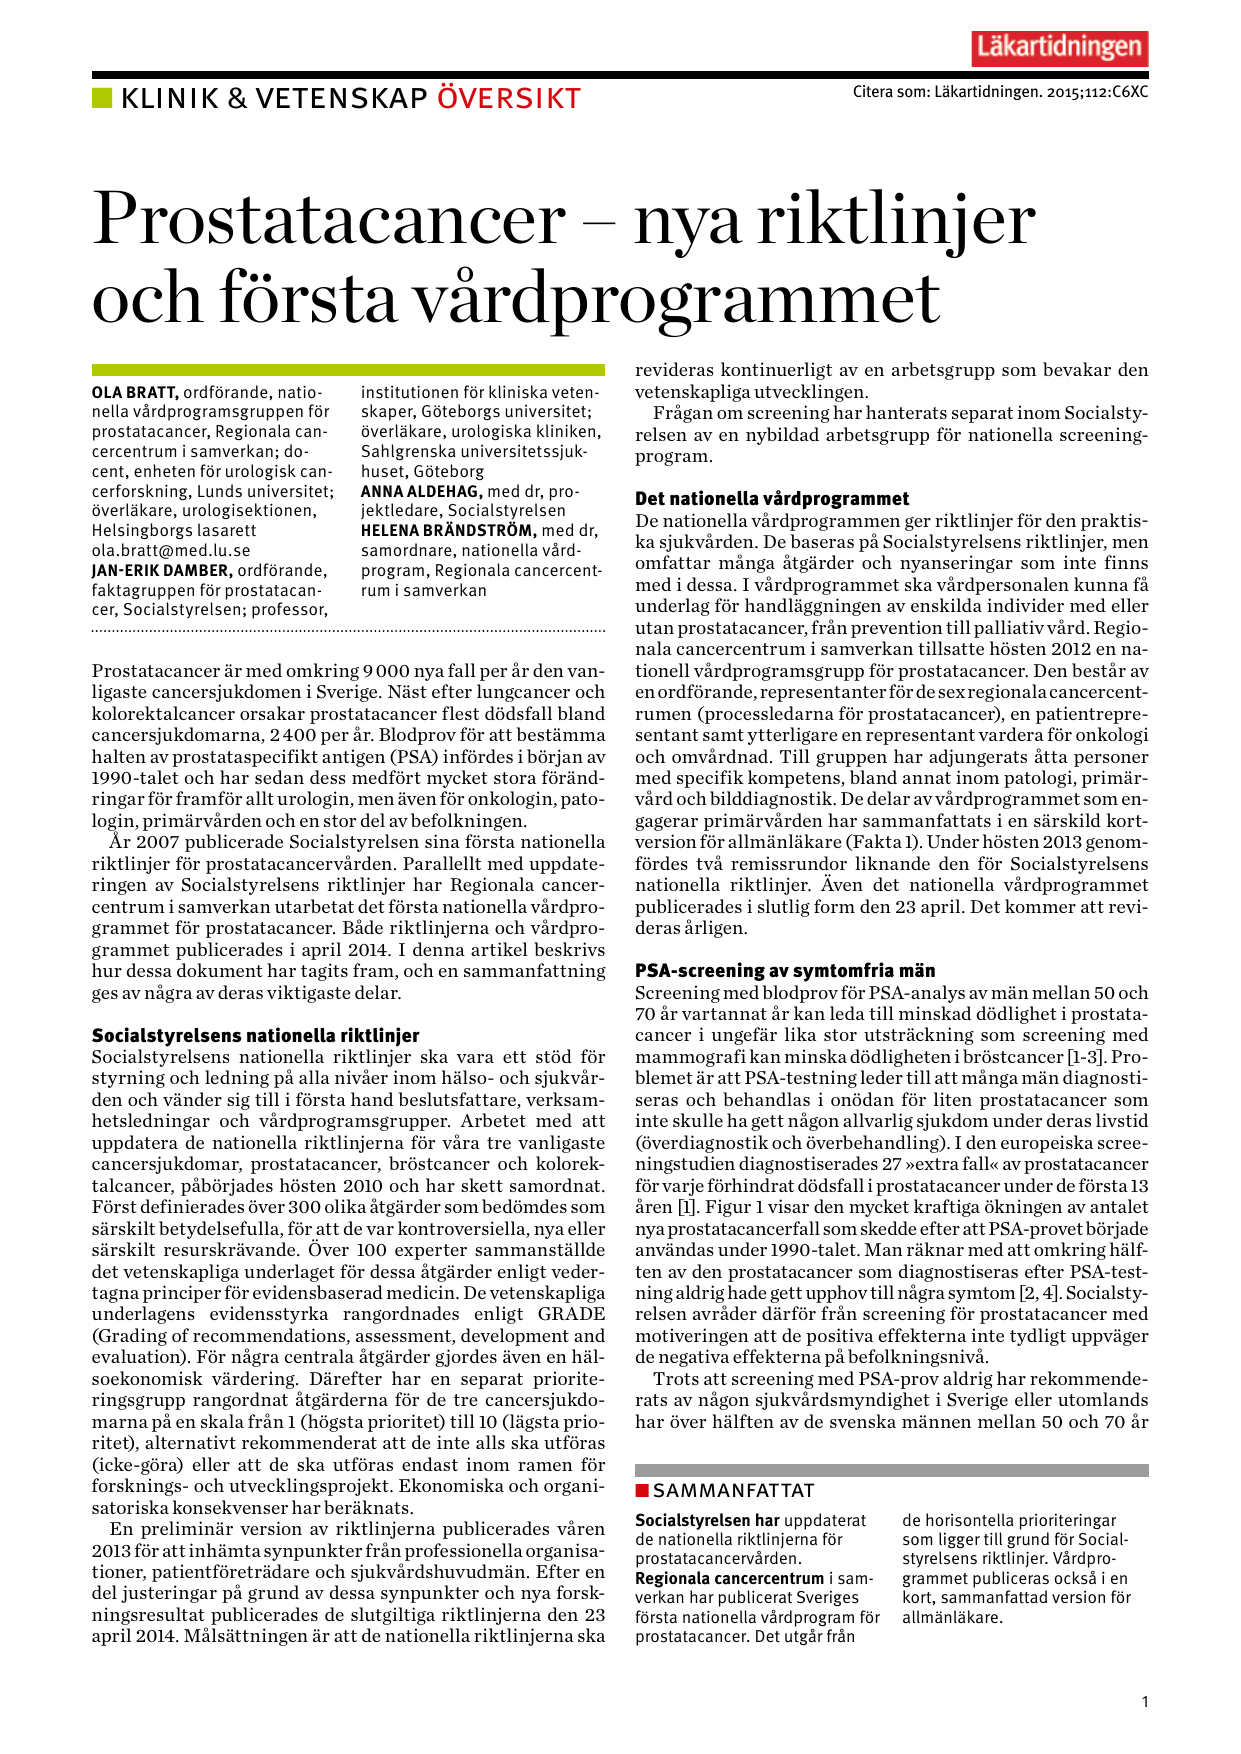 prostatacancer nationellt vårdprogram